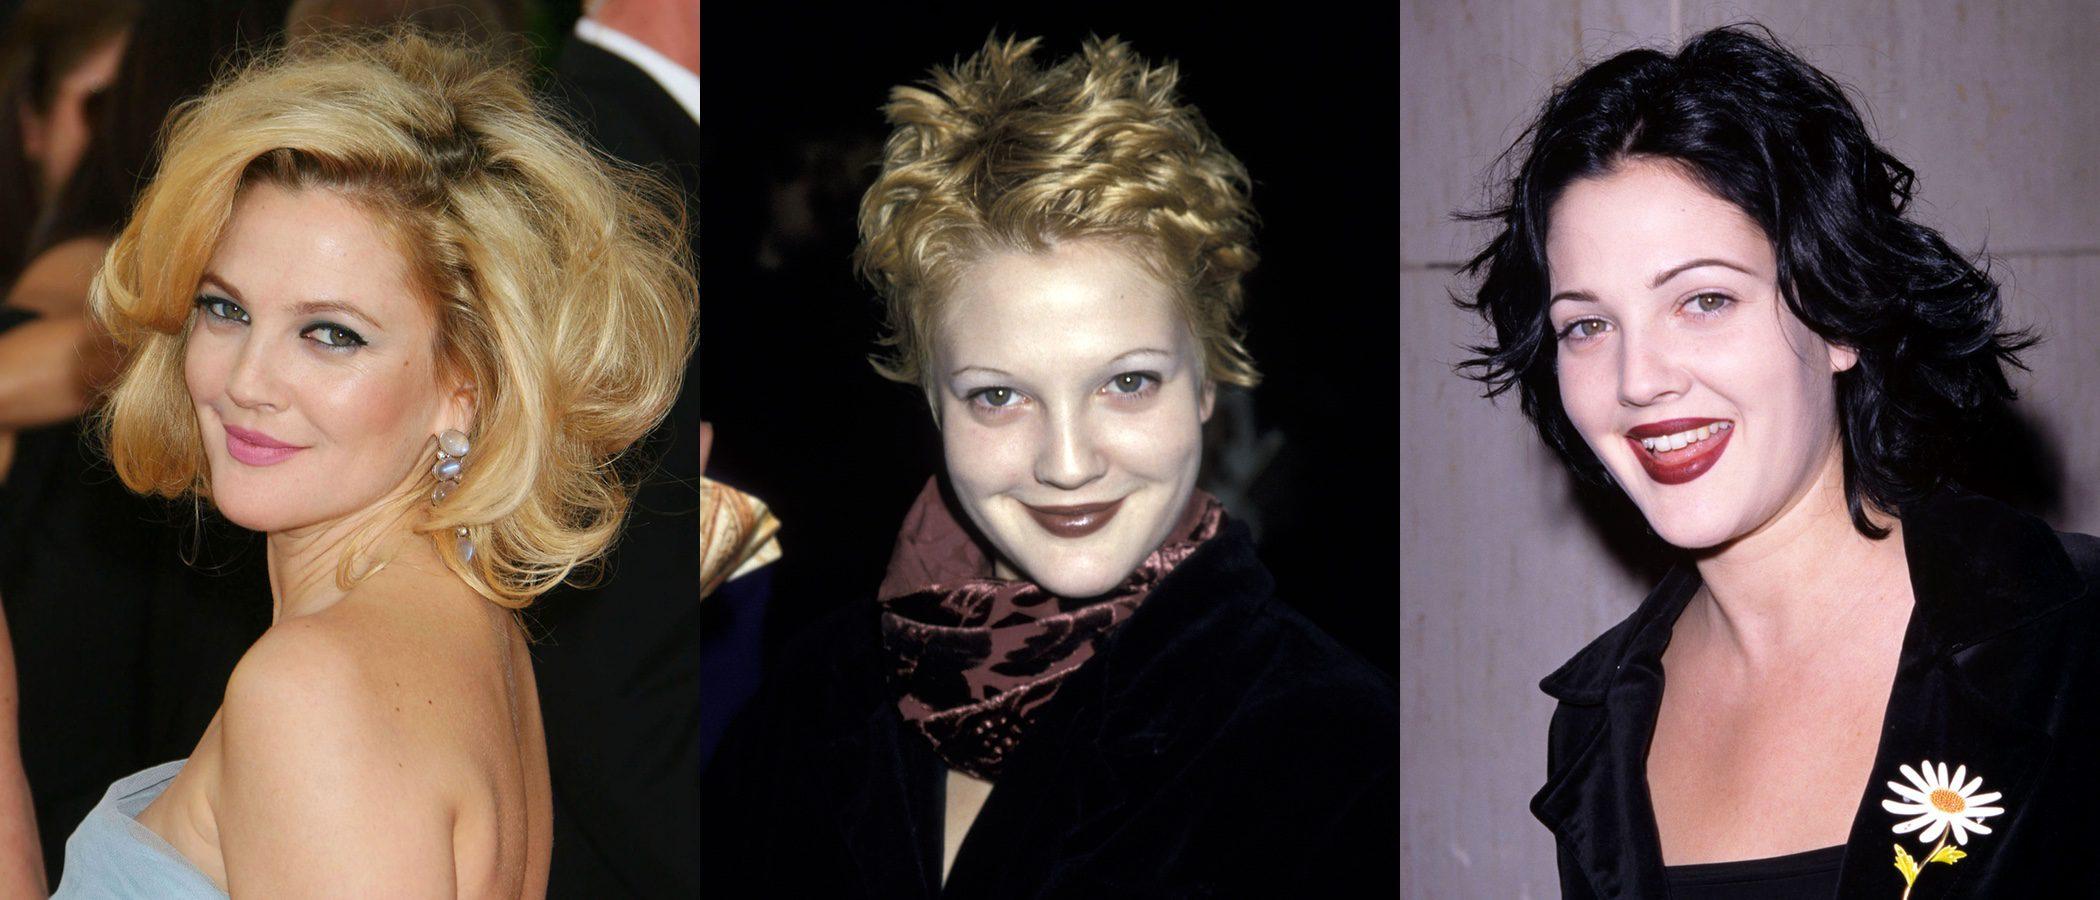 Los peores beauty looks de Drew Barrymore